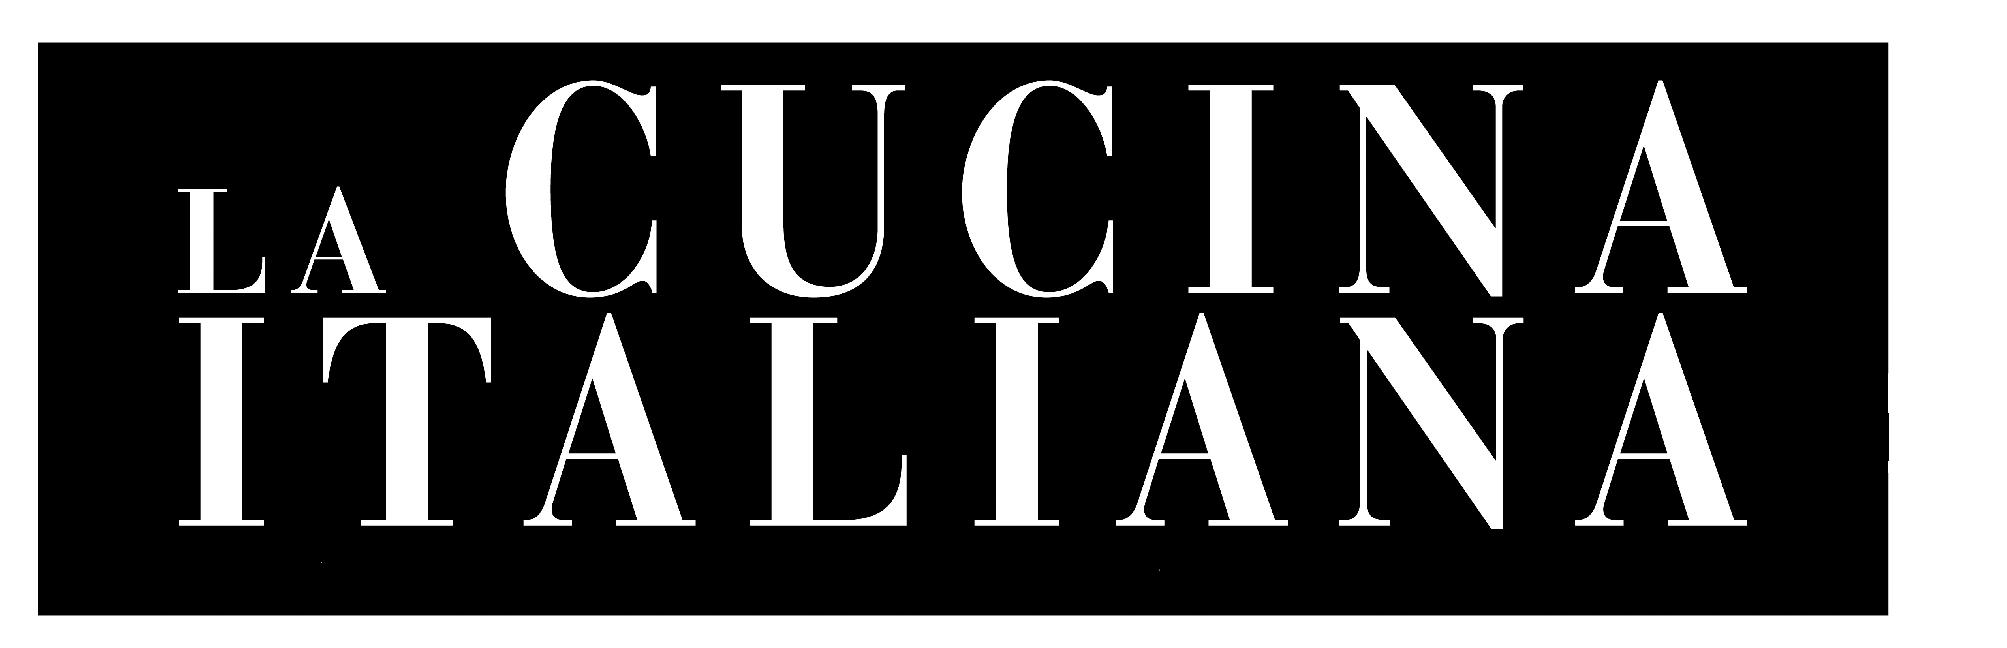 La cucina italiana immagini for Cucina logo